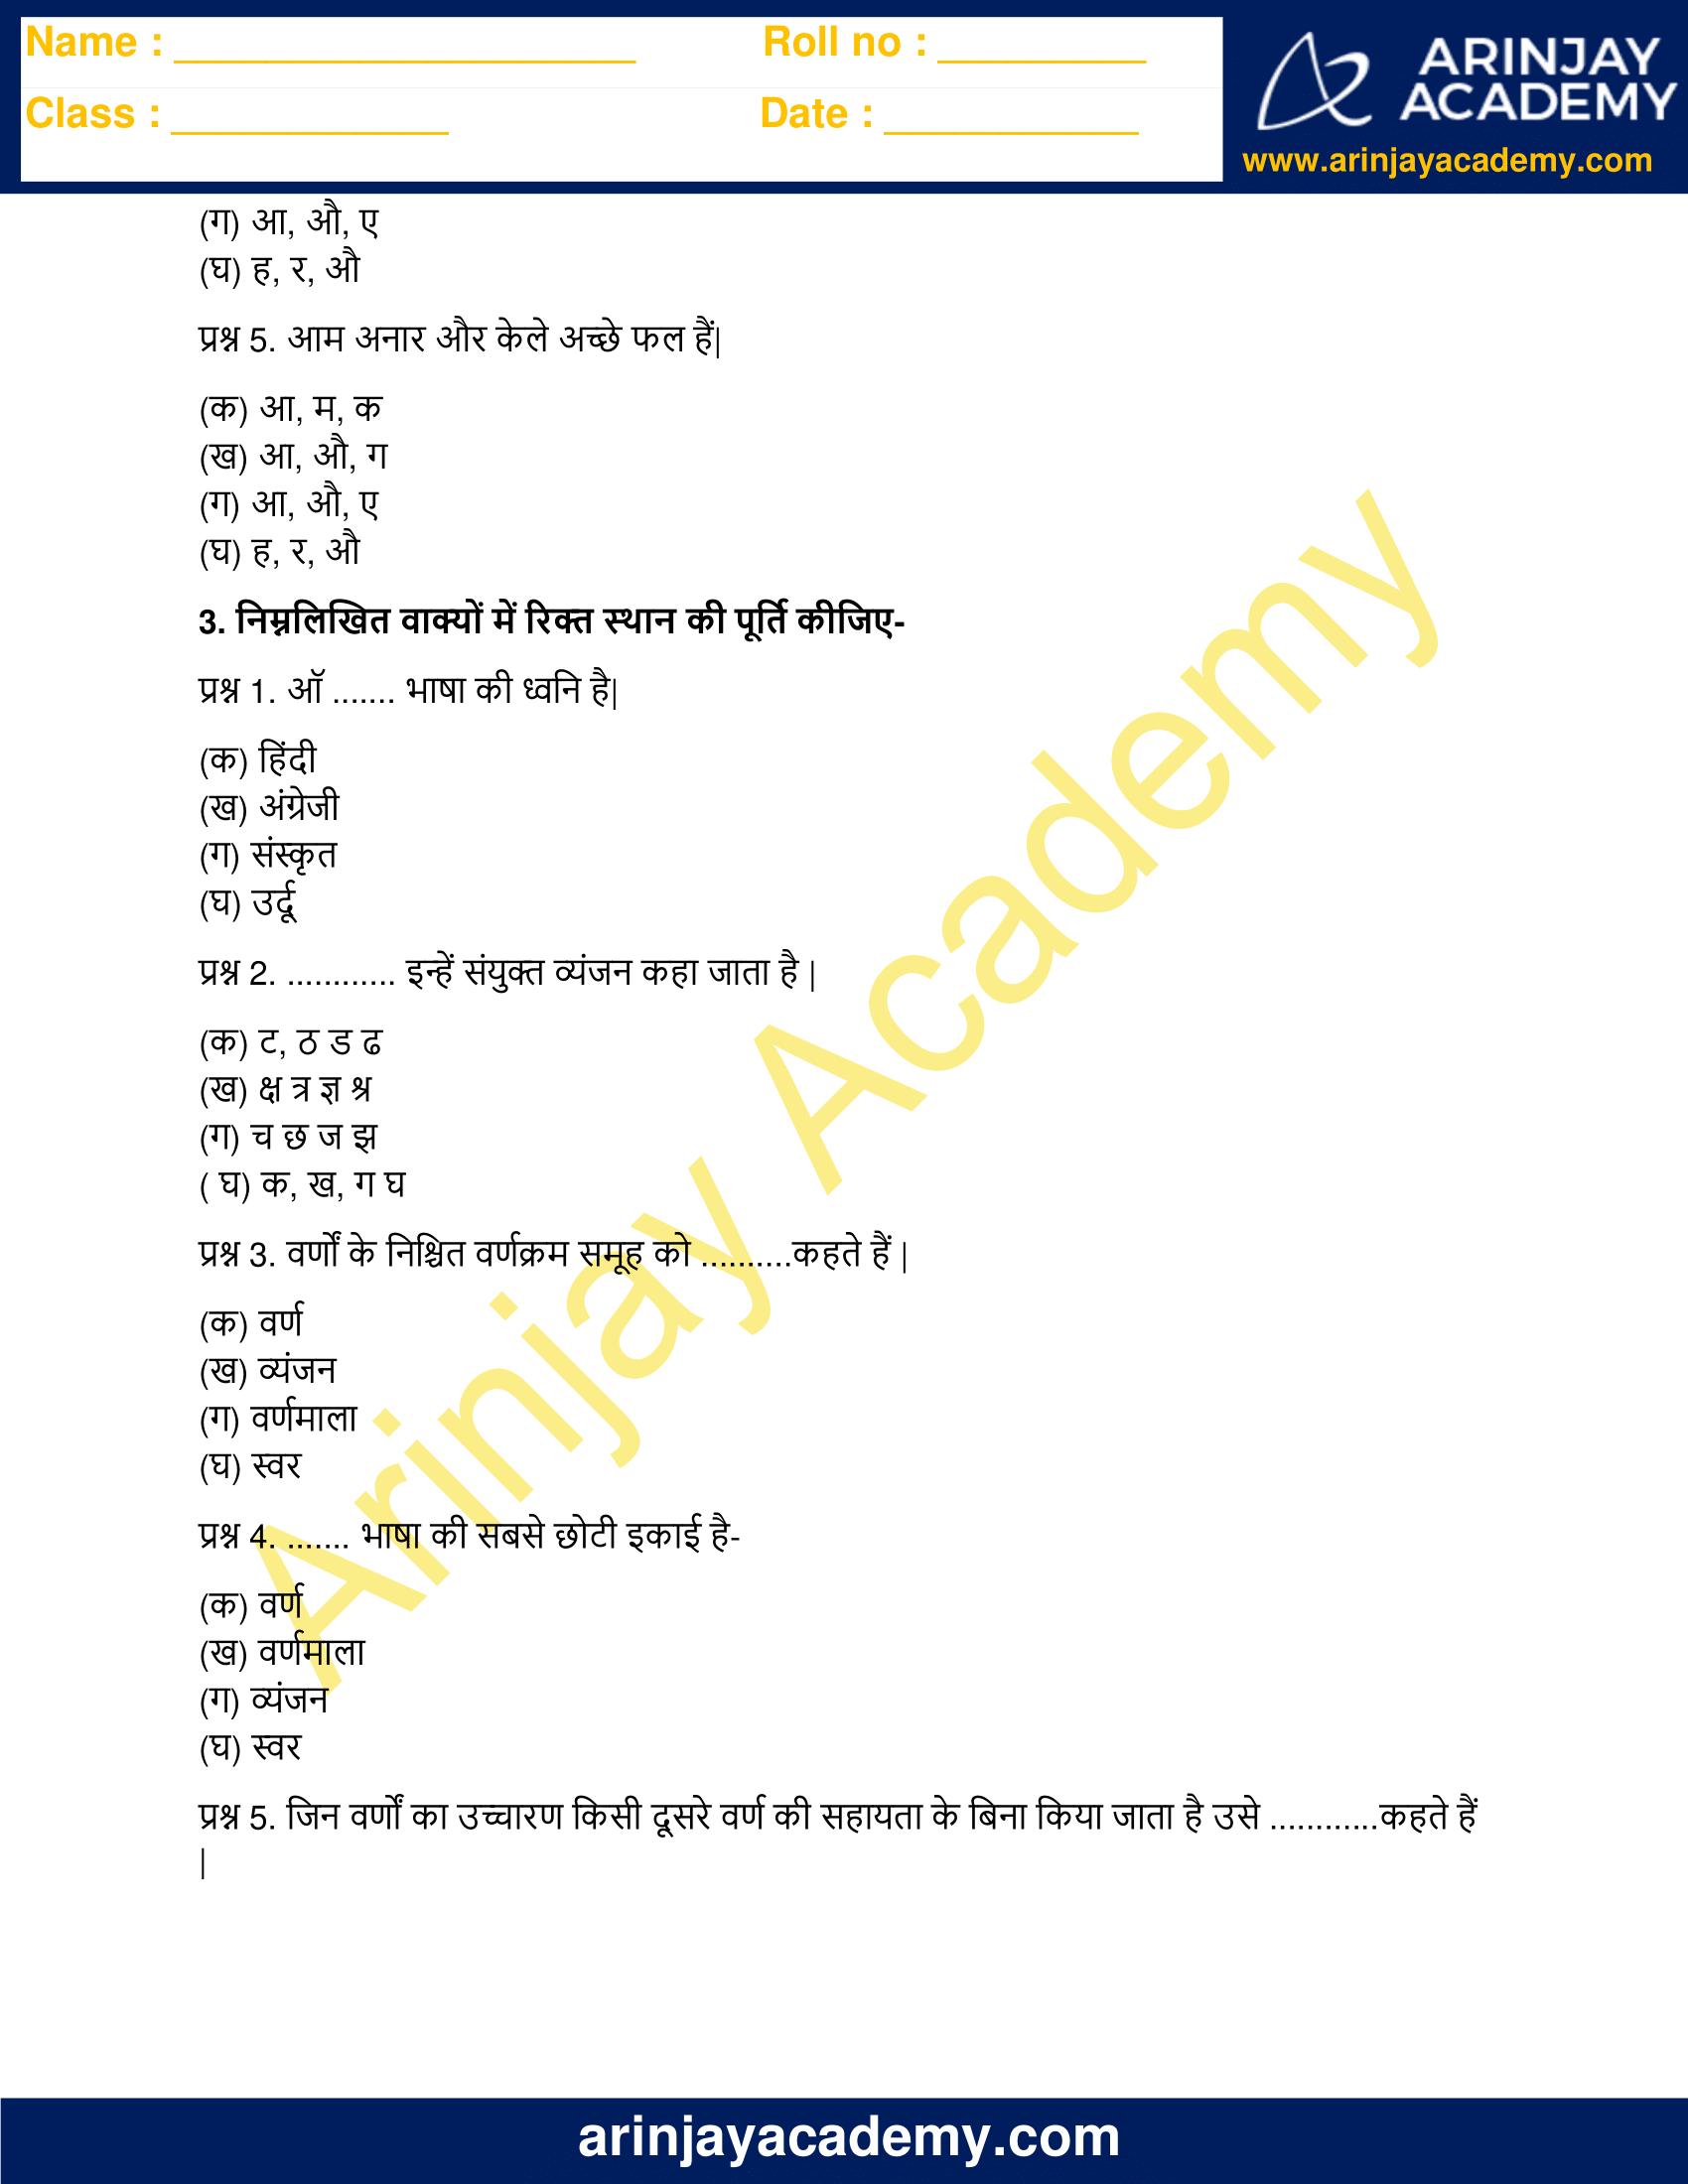 Varn aur Varnamala Worksheet for Class 3 image 3